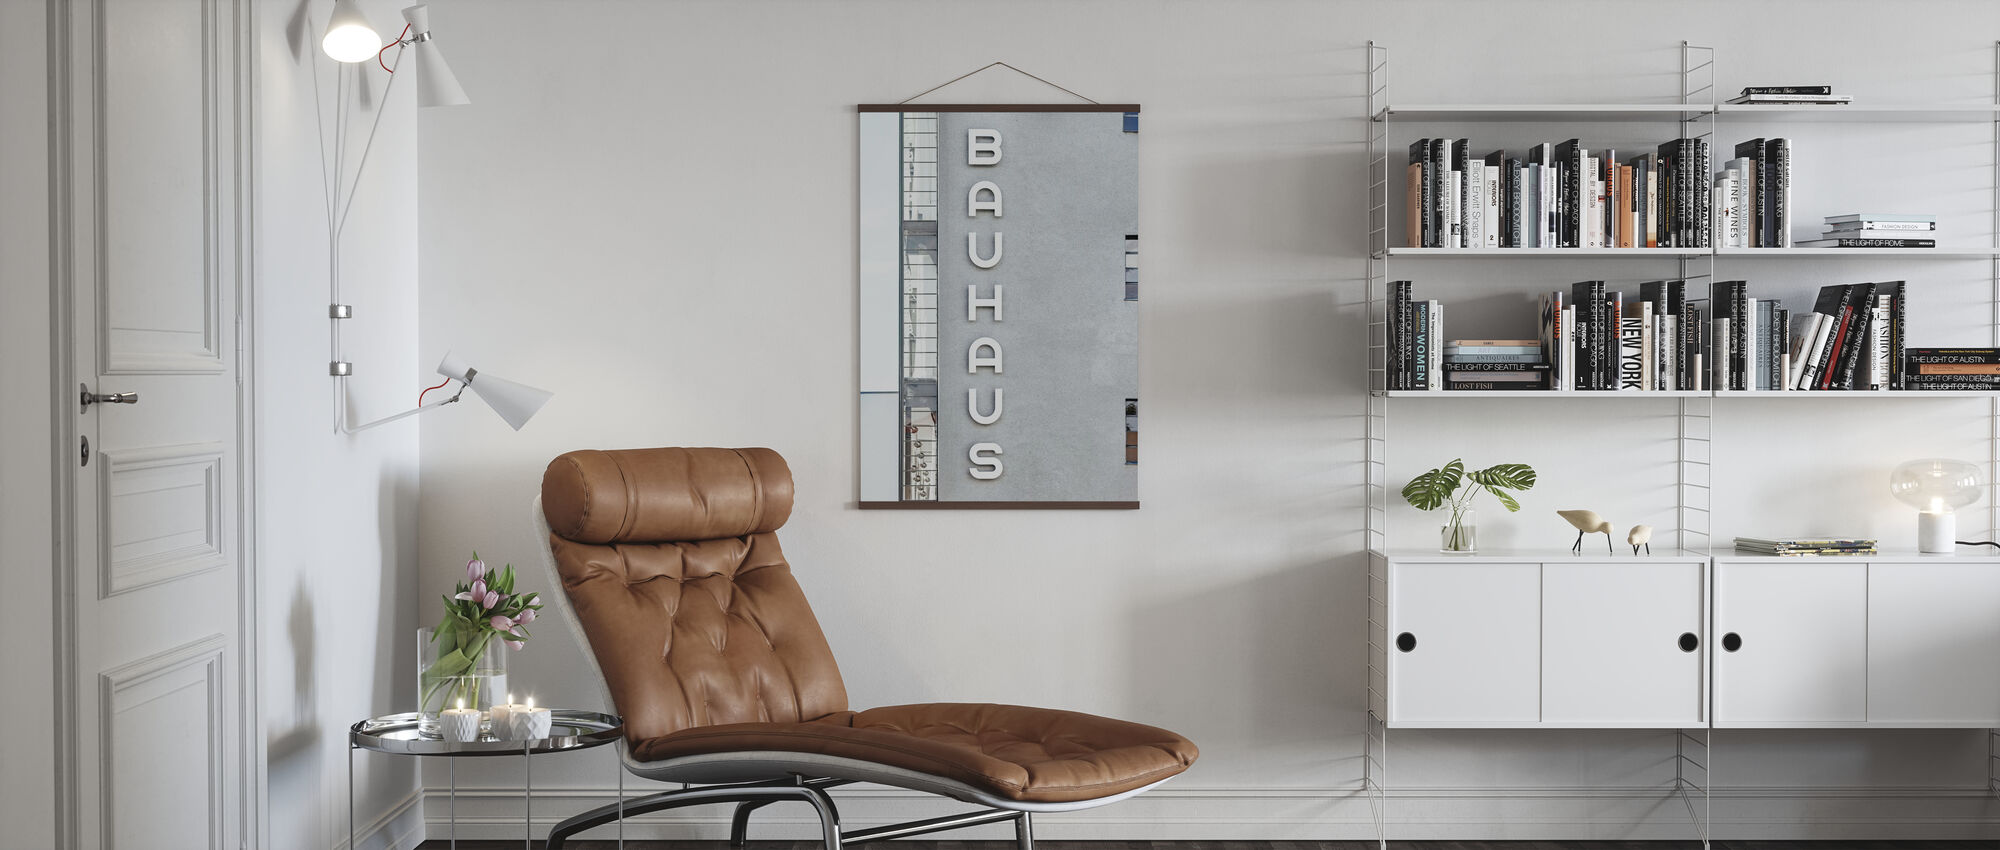 Bauhaus-Bauart - Poster - Wohnzimmer